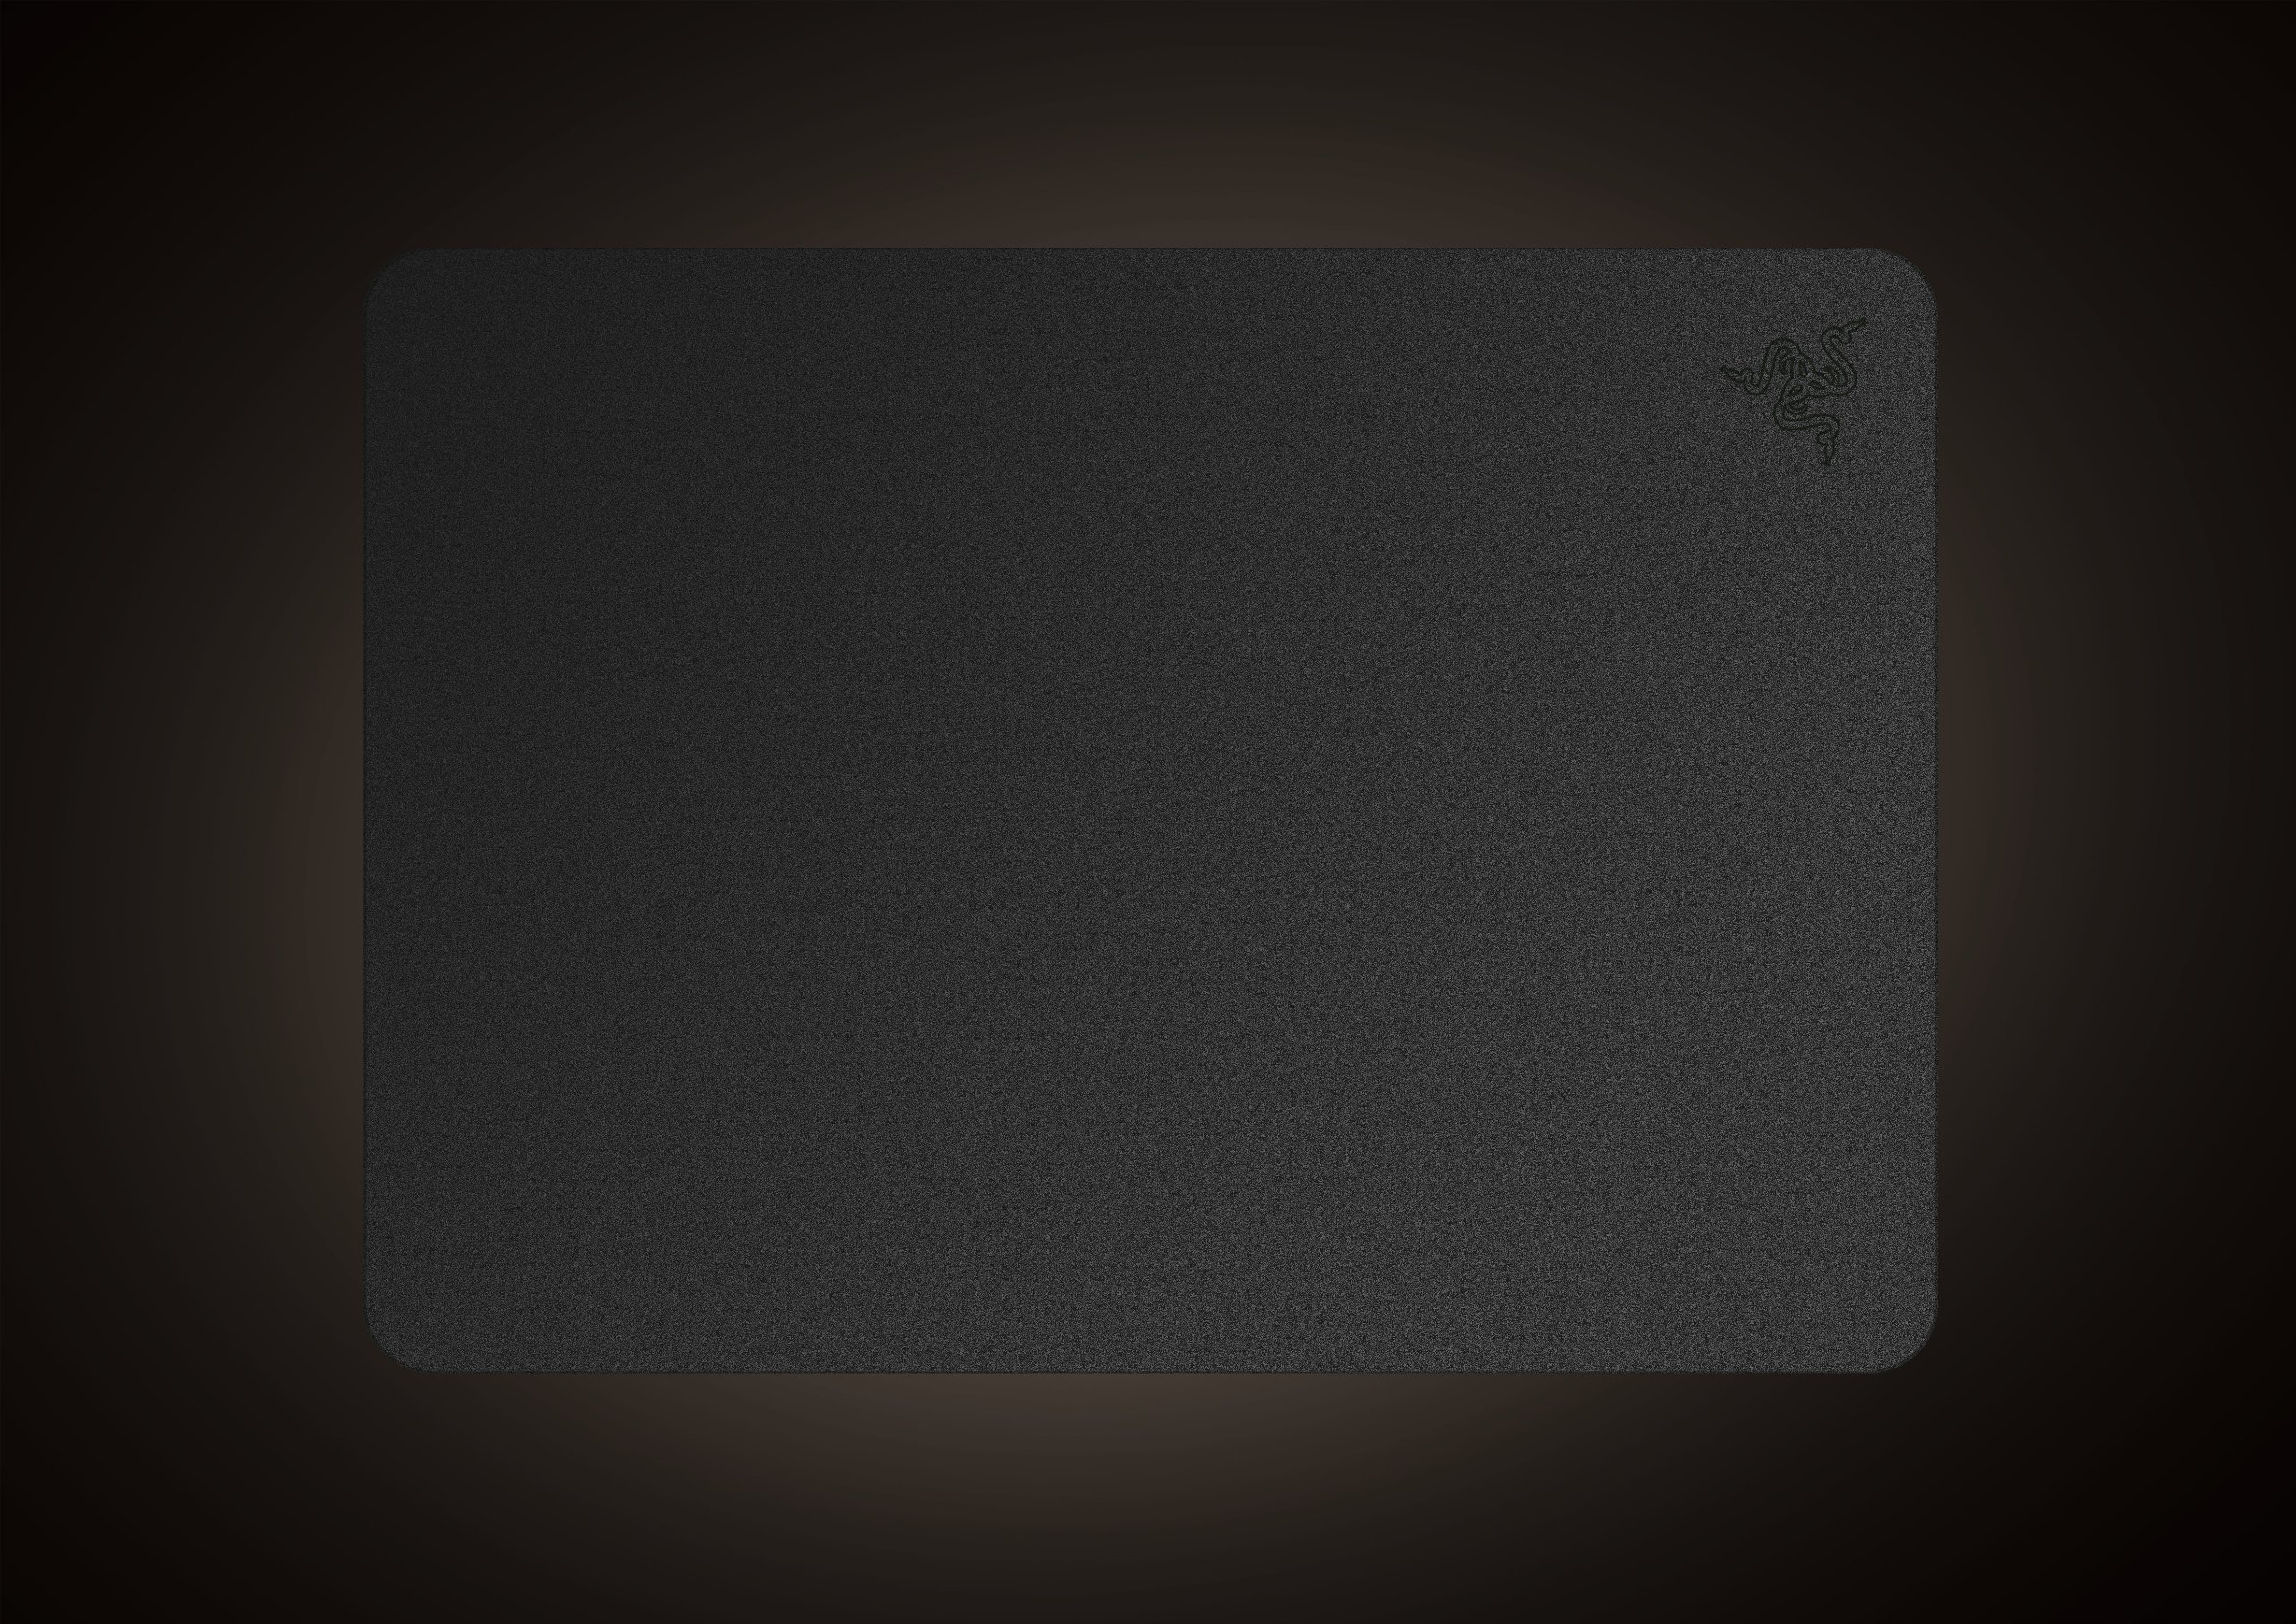 Razer Destructor 2: Optimized Surface Coating - Textured Finish - Non-Slip Rubber Base - Expert Hard Gaming Mouse Mat by Razer